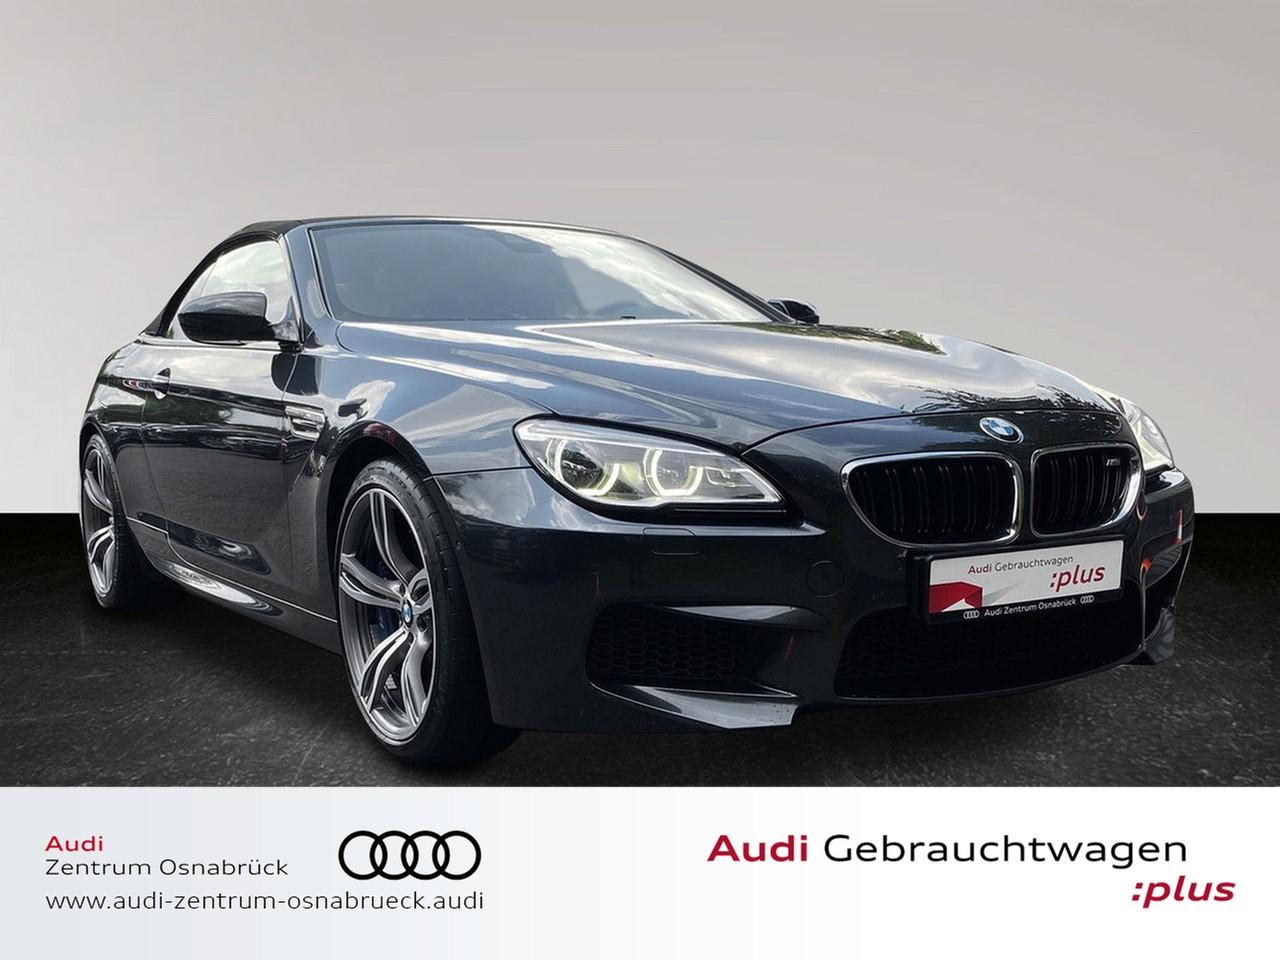 BMW M6 Cabrio LCI DKG Navi HUD LED SoftClose B&O TopView Leder 20-Zoll, Jahr 2016, Benzin